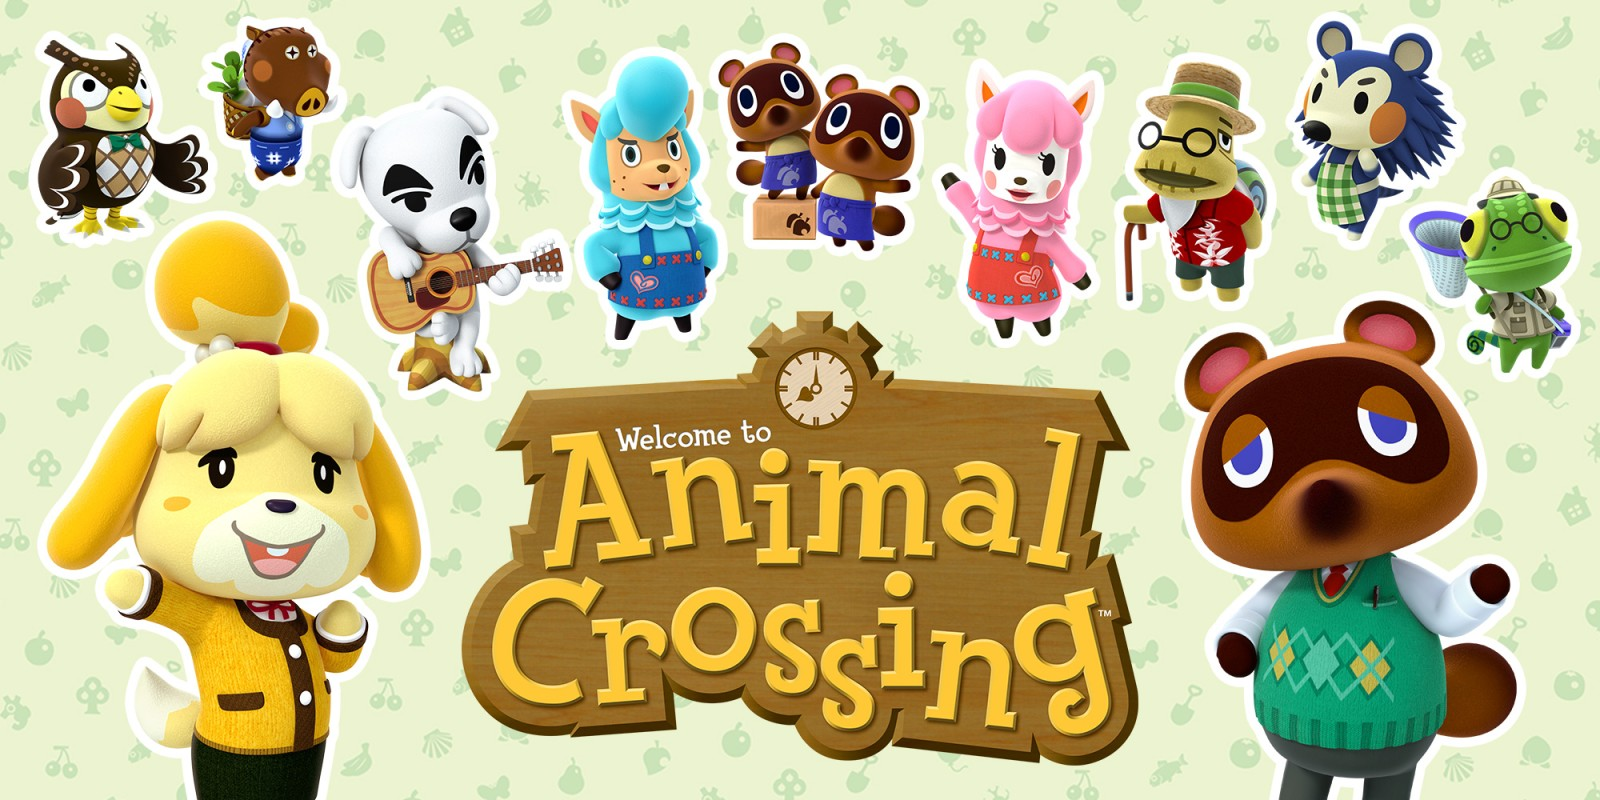 H2x1_AnimalCrossing_Hub_v03_image1600w